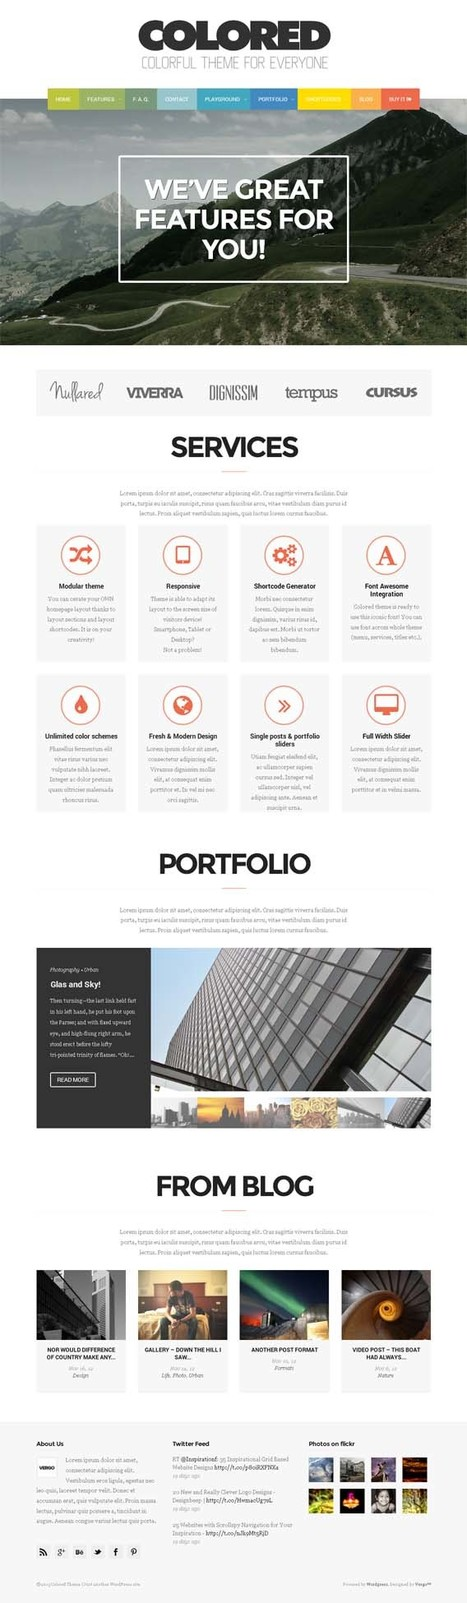 Colored, Premium WordPress Portfolio Theme | WP Download | Premium WordPress Themes Download | Scoop.it